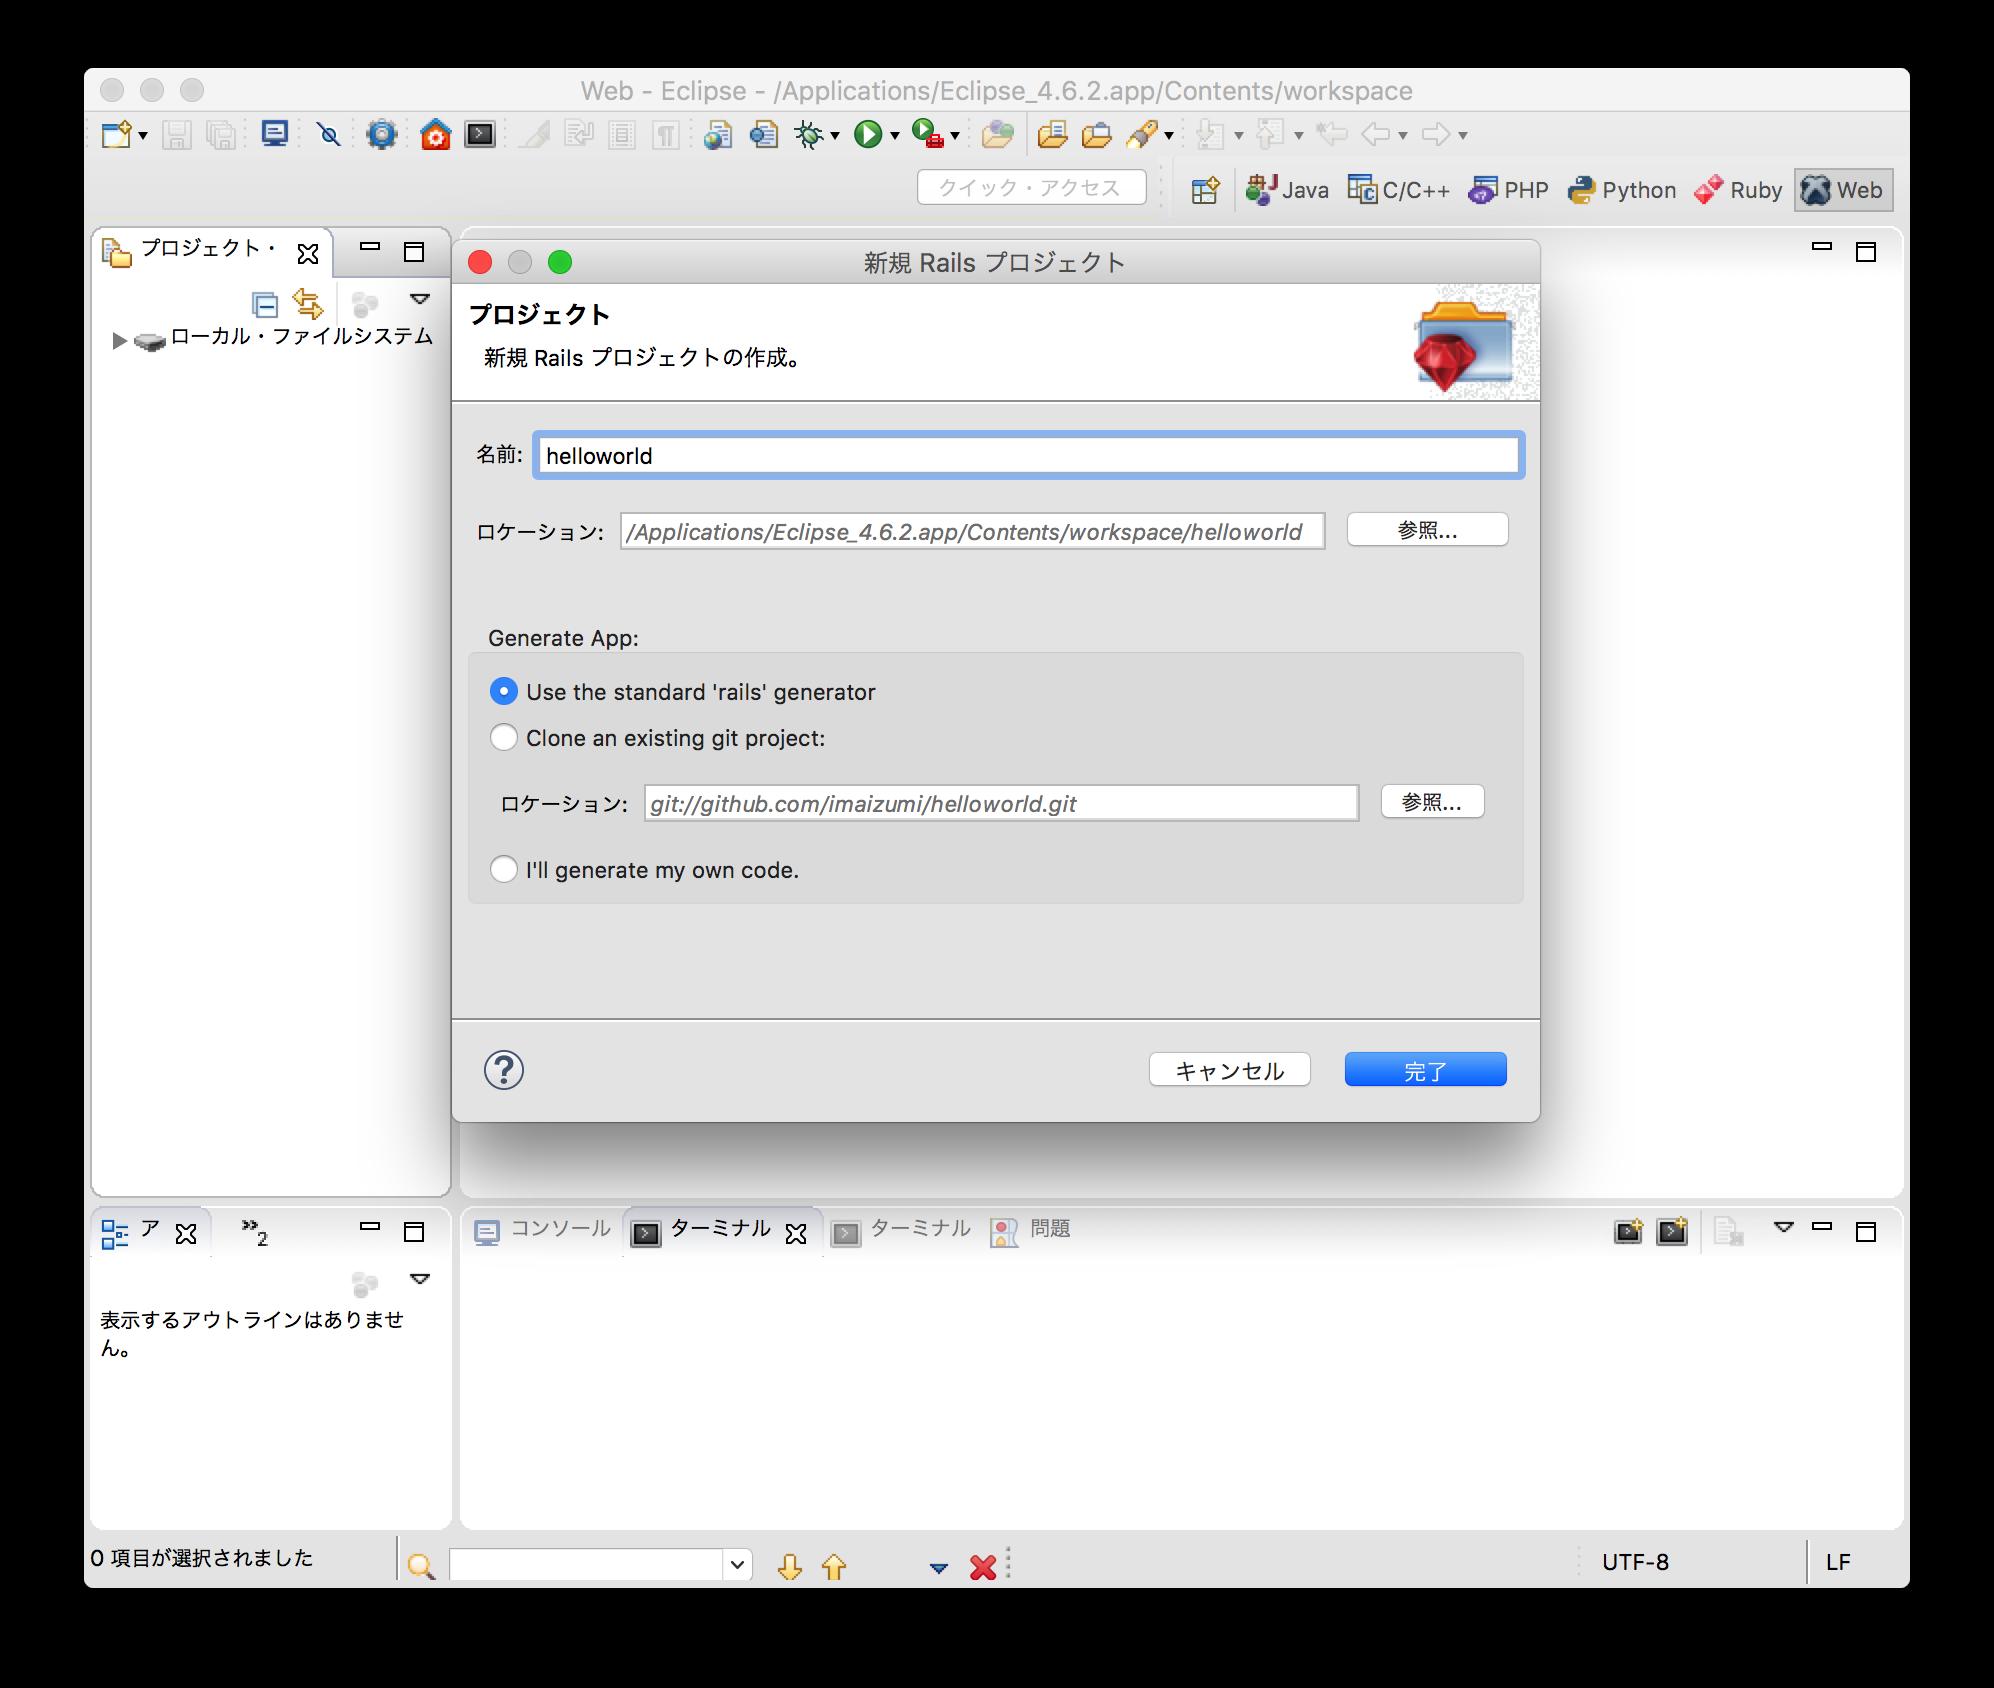 Mac + Eclipse + Ruby on Rails (Aptana Studio 3)Hello World